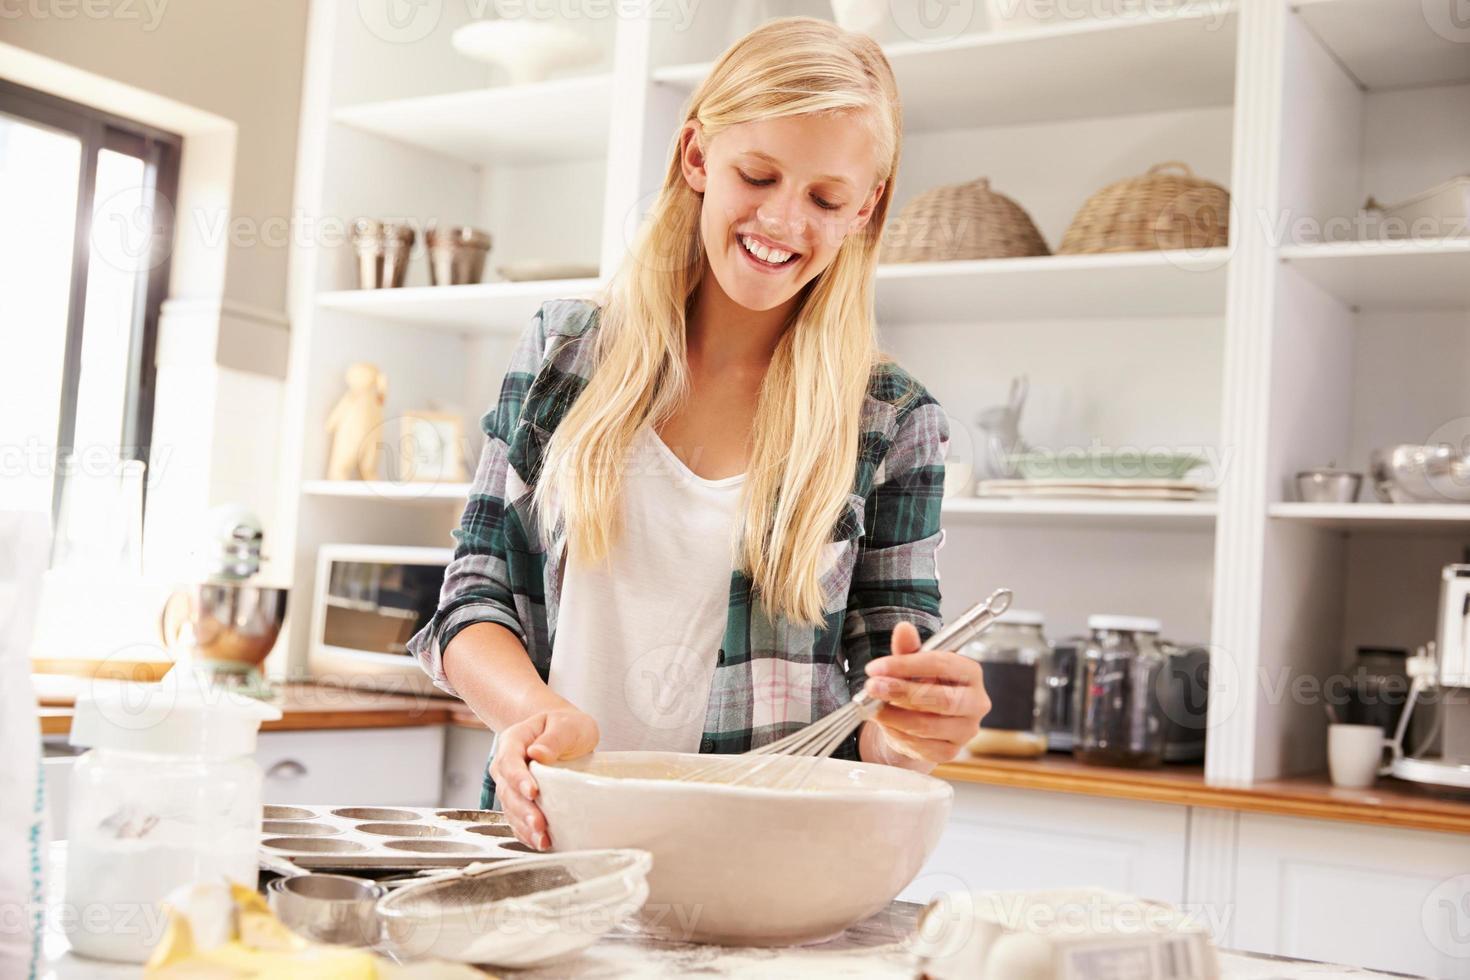 Young girl baking at home photo